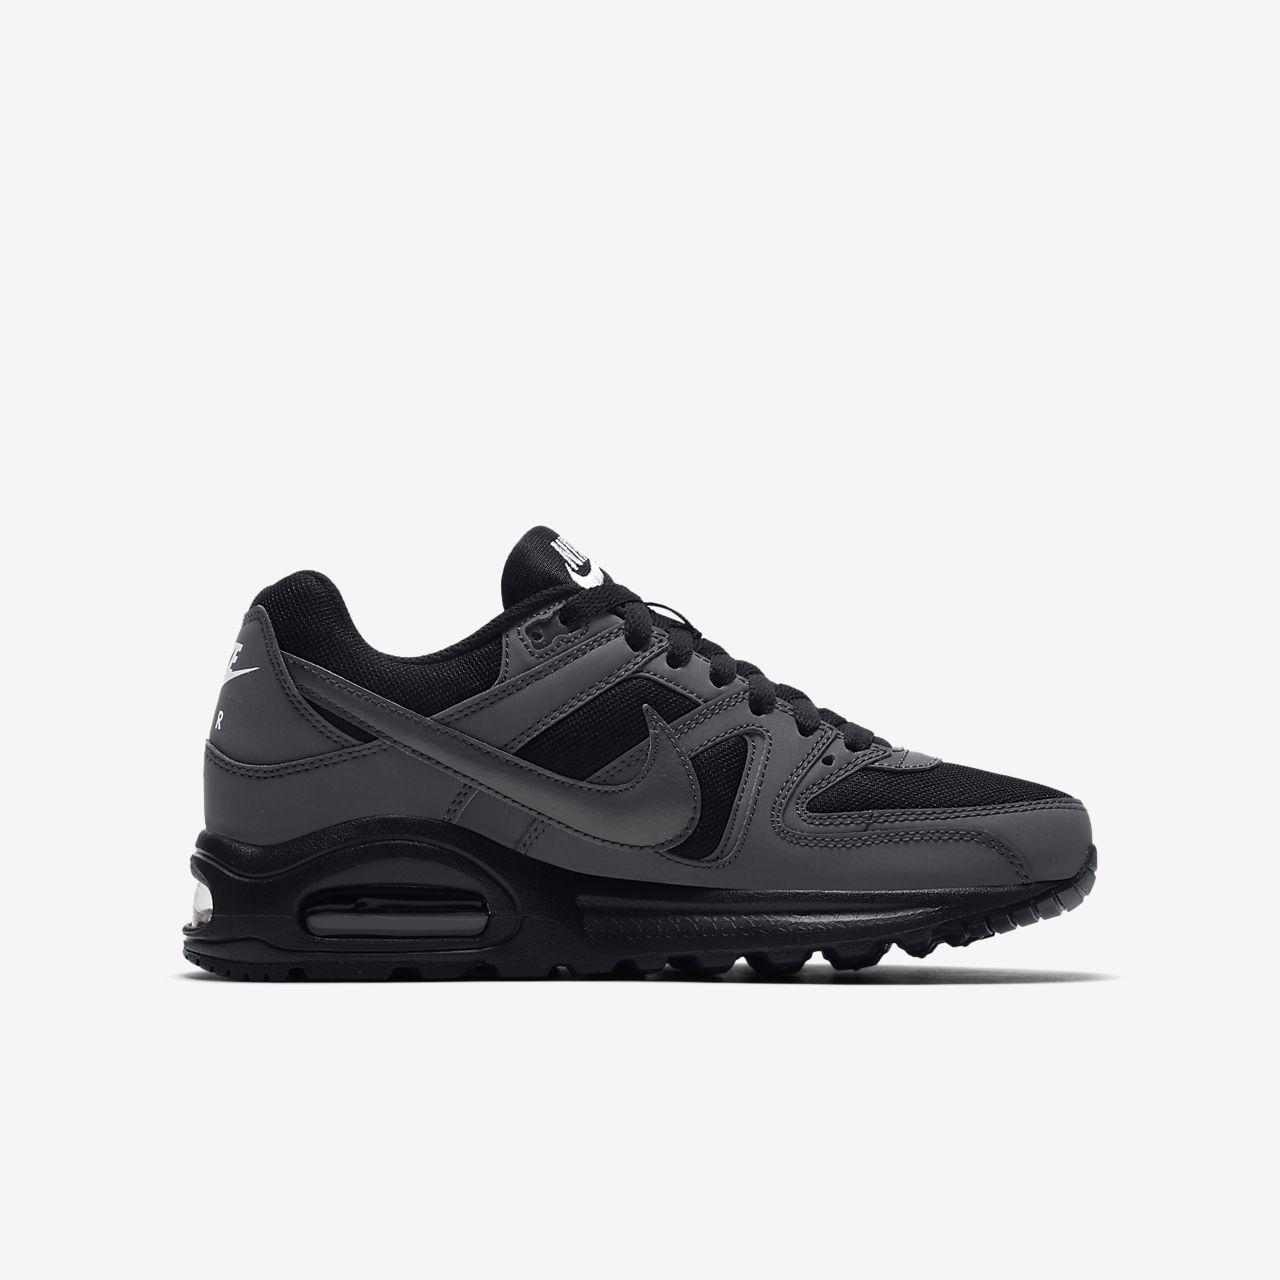 watch 2e11b e809c ... Nike Air Max Command Flex Older Kids  Shoe